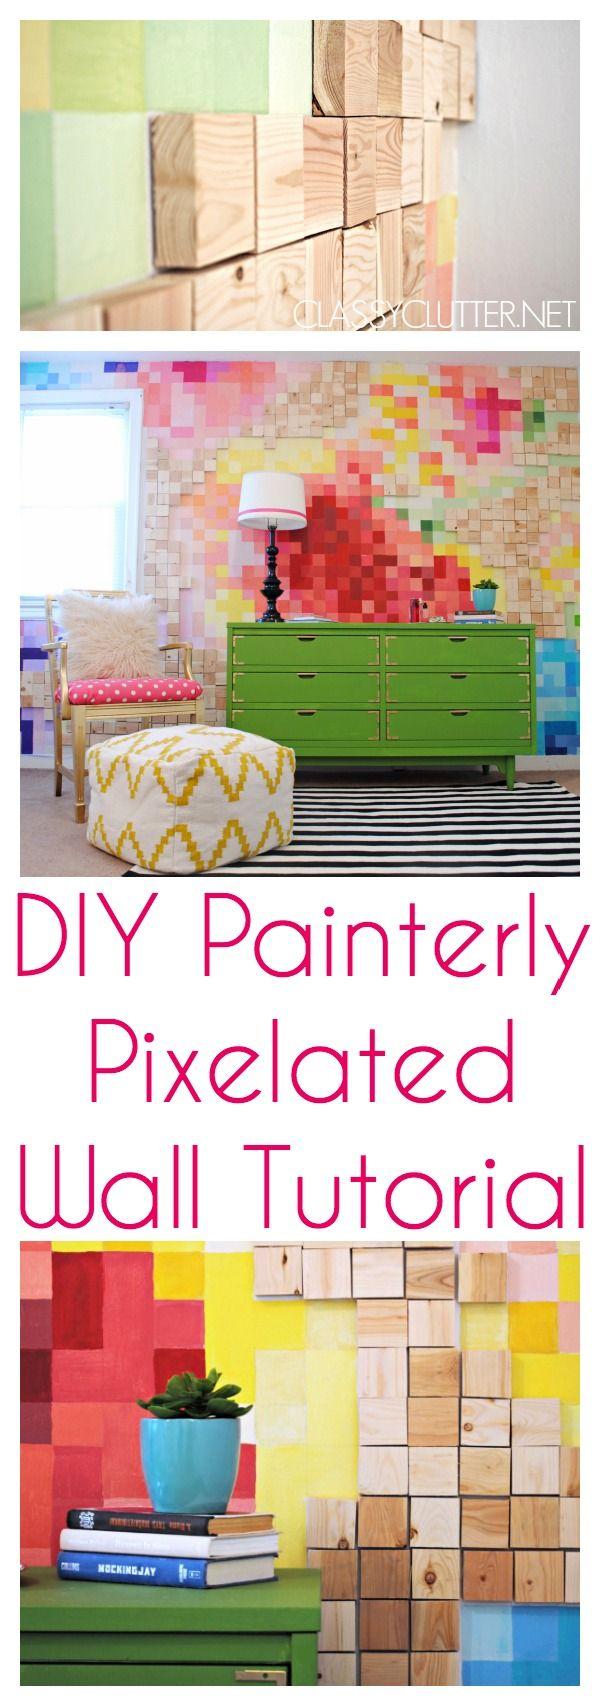 DIY Painterly Pixelated Wall Tutorial - www.classyclutter.net